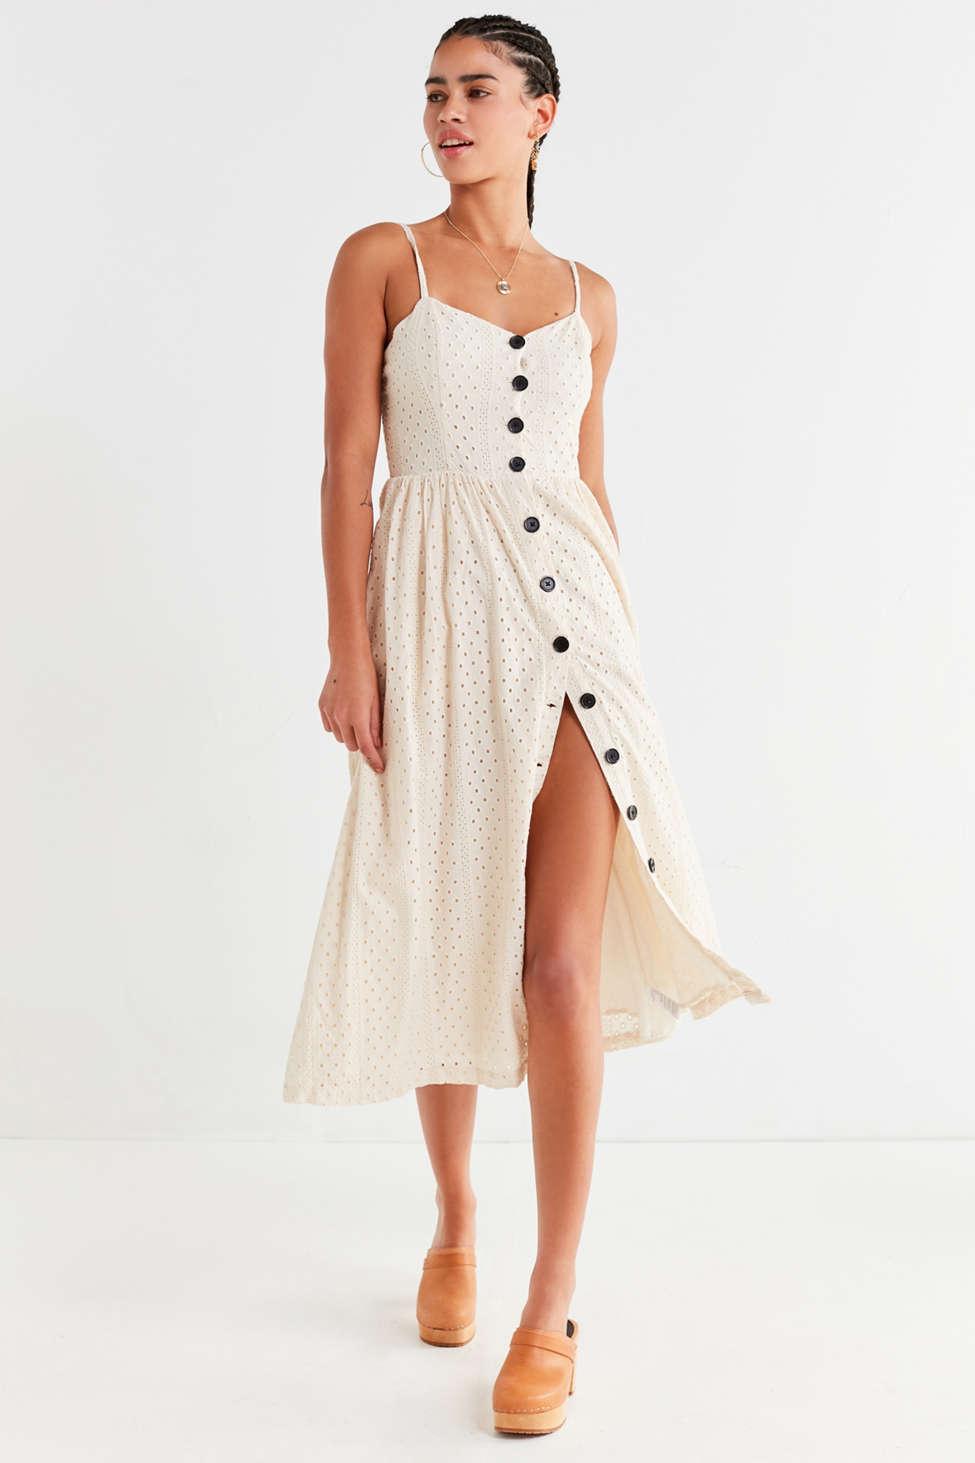 Plus Size Midi Dresses